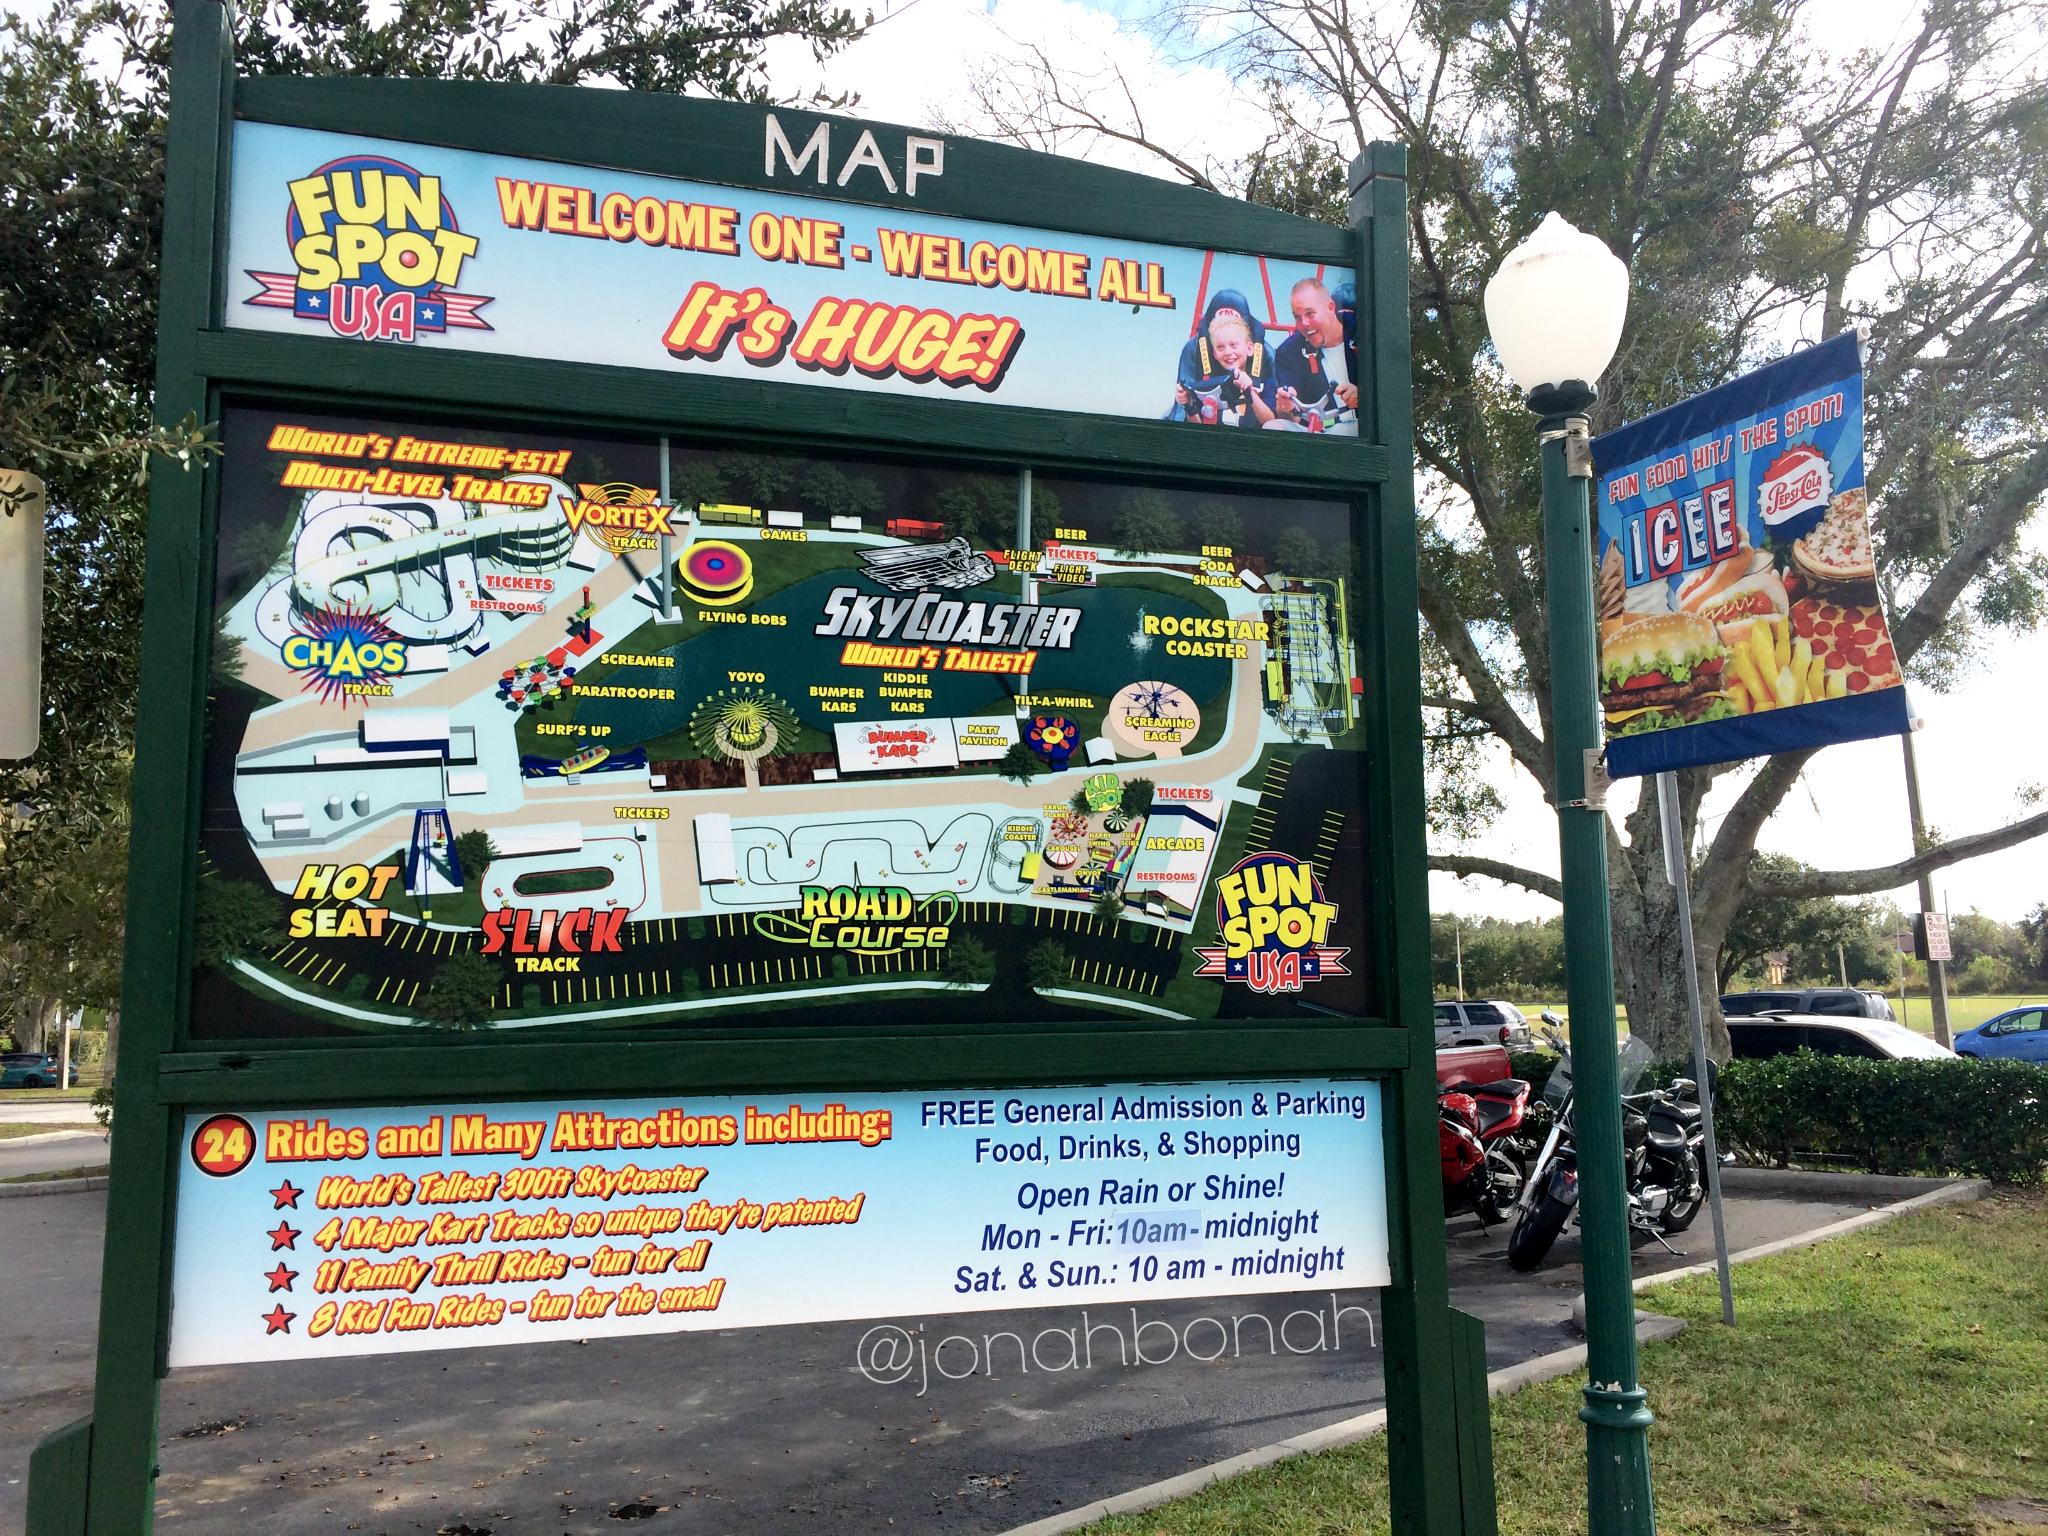 Kissimmee Florida Map.File Map Of Fun Spot America In Kissimmee Fl 15894516845 Jpg